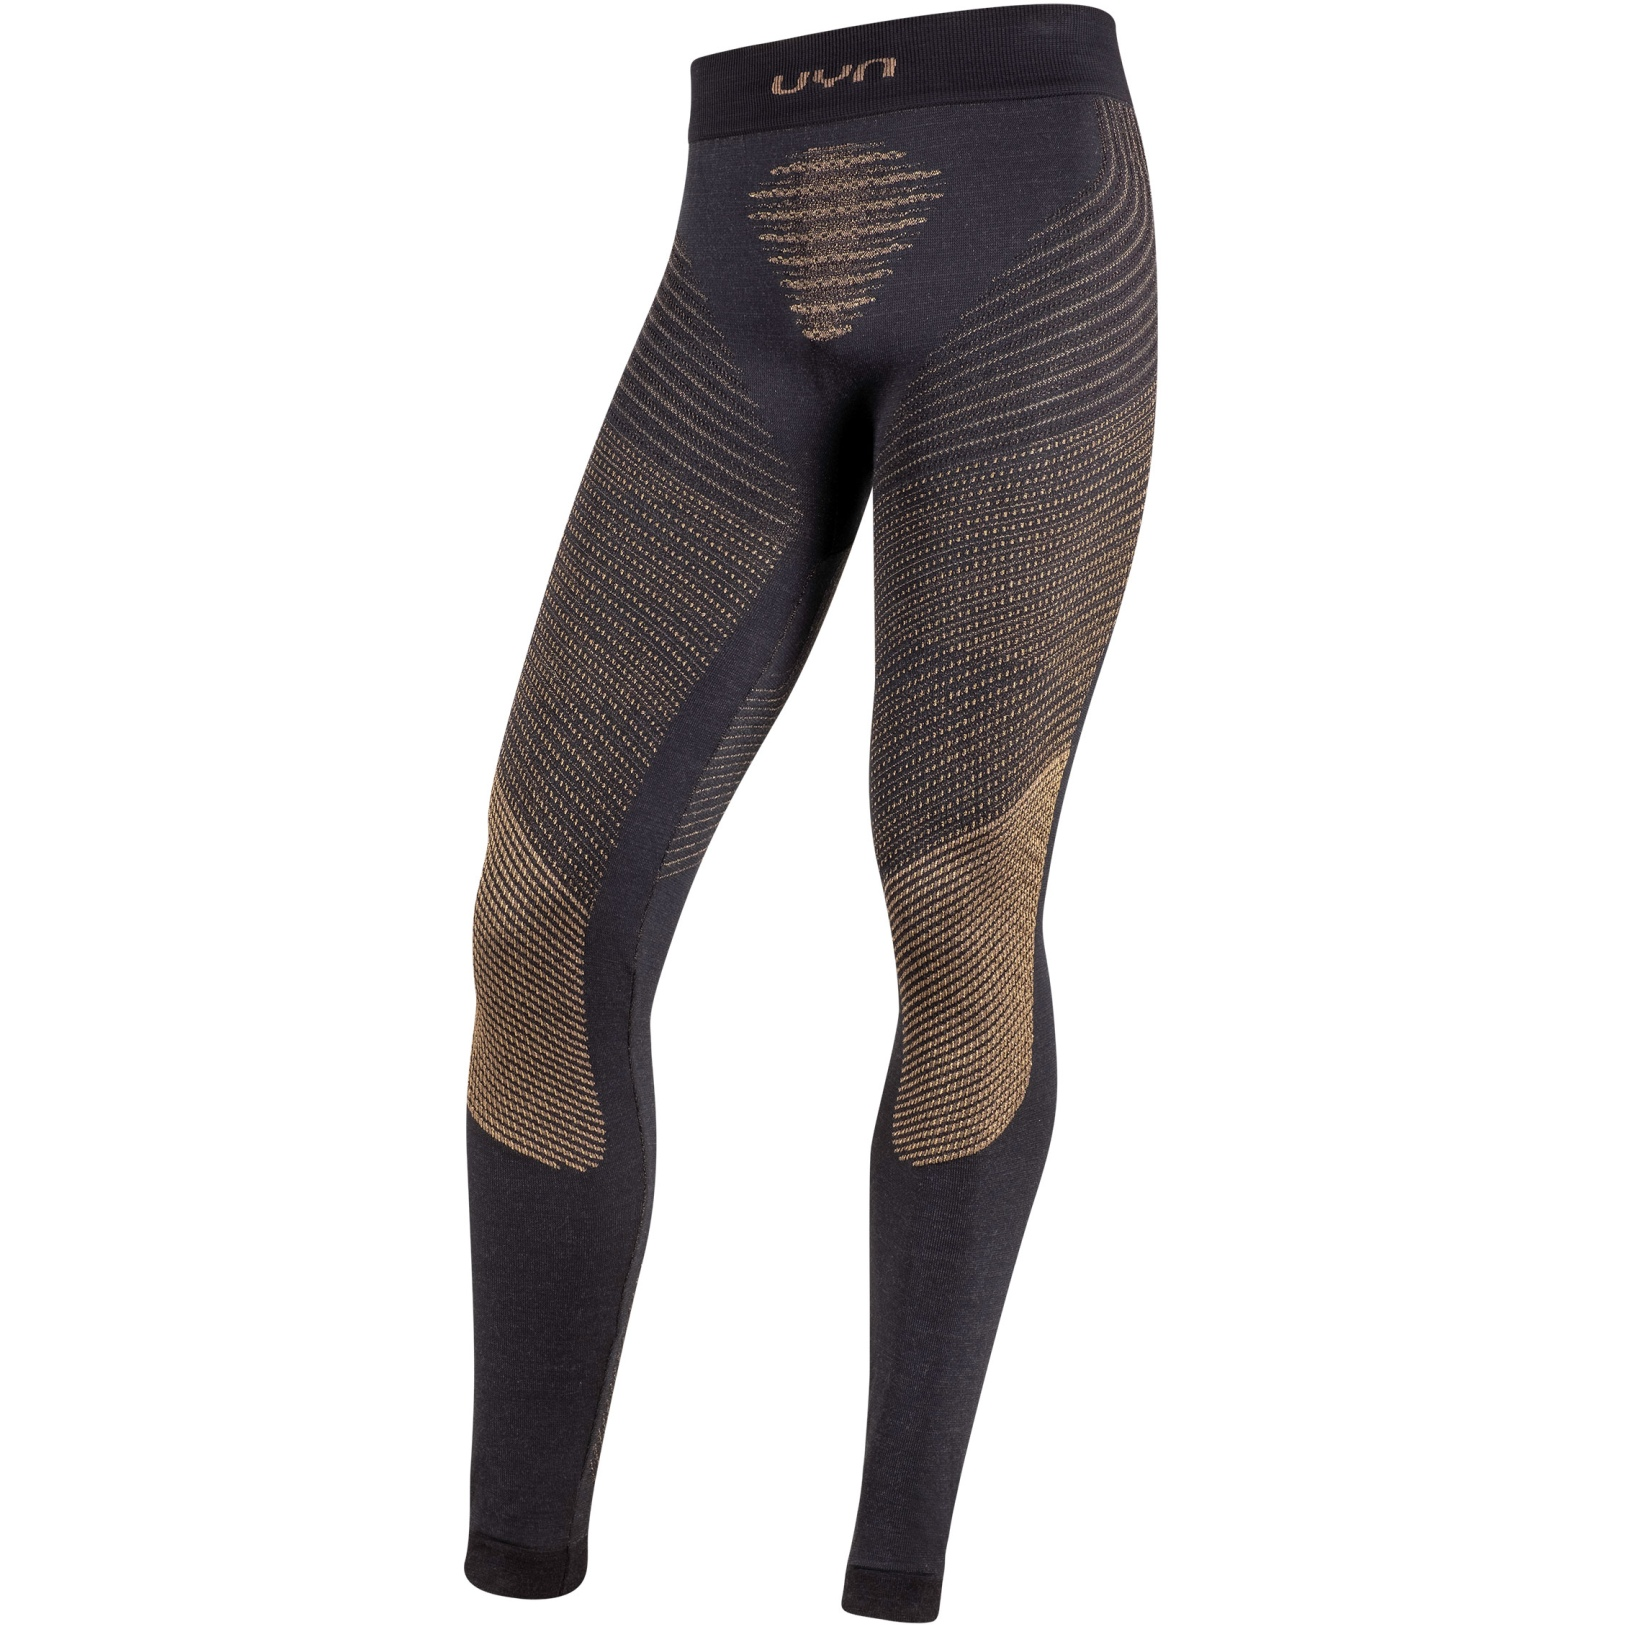 Image of UYN Cashmere Shiny 2.0 Underwear Pants - Celebrity Gold